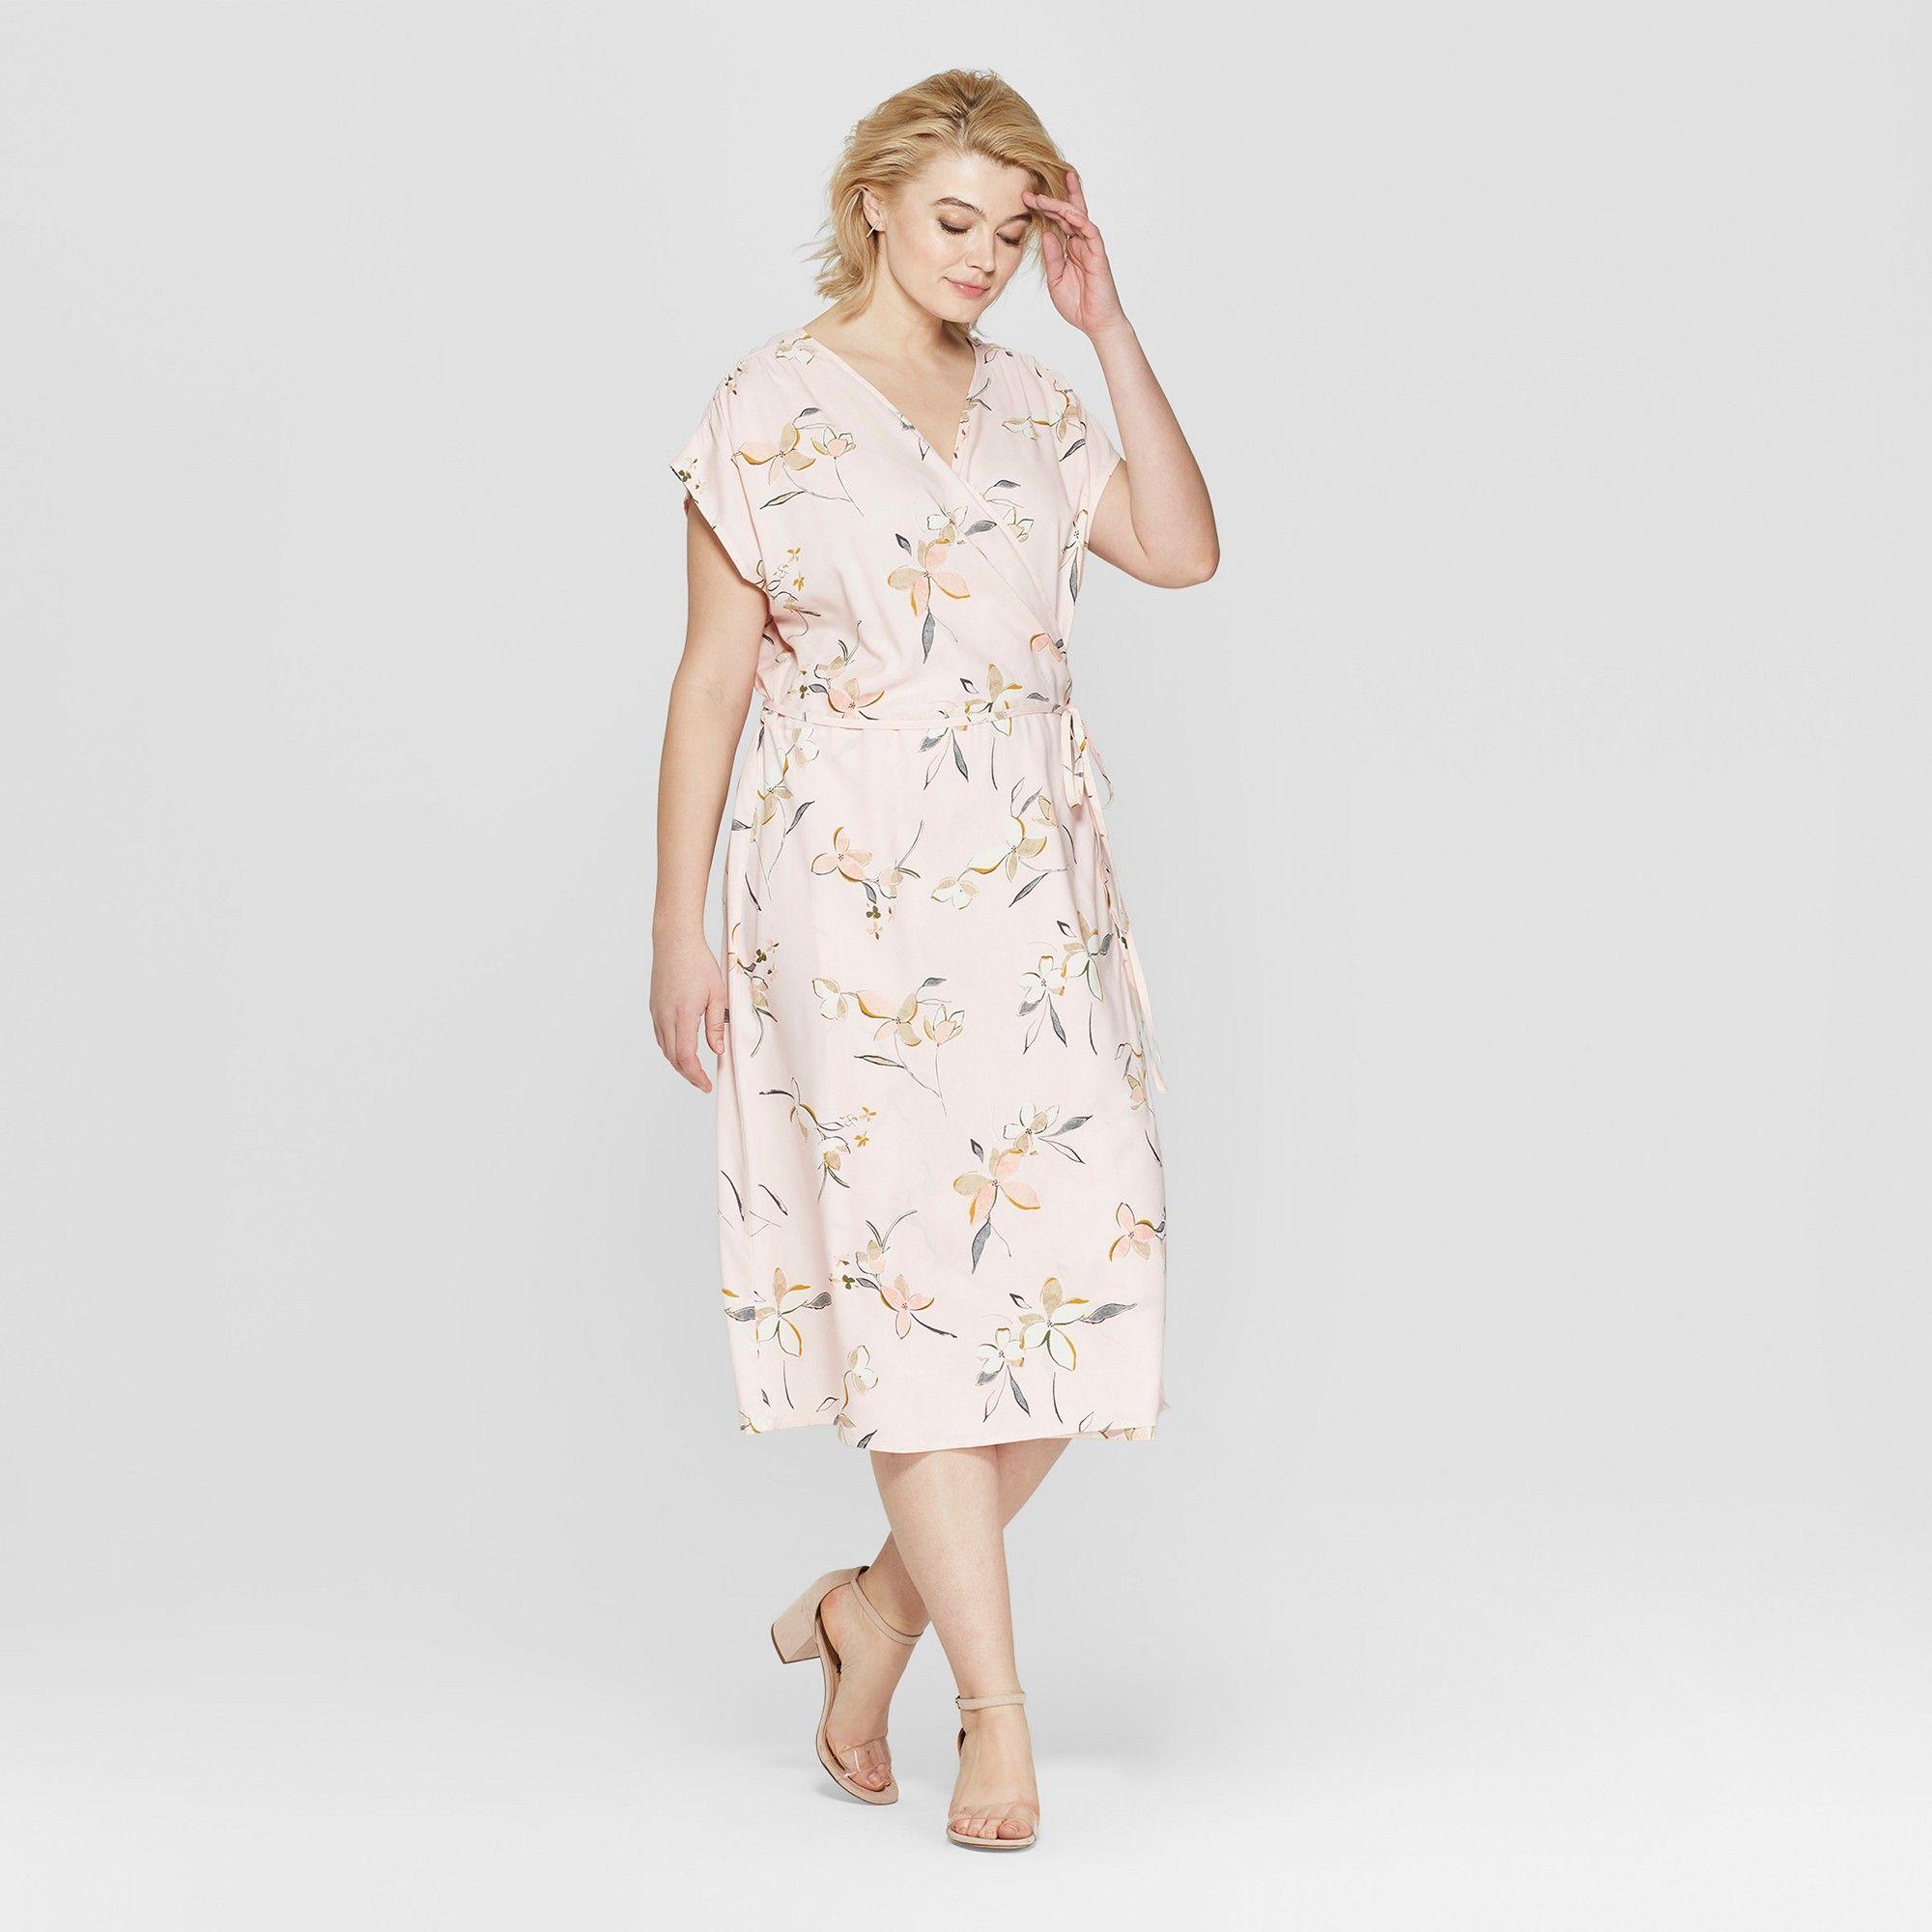 Women's Plus Size Floral Print Short Sleeve Wrap Midi Dress